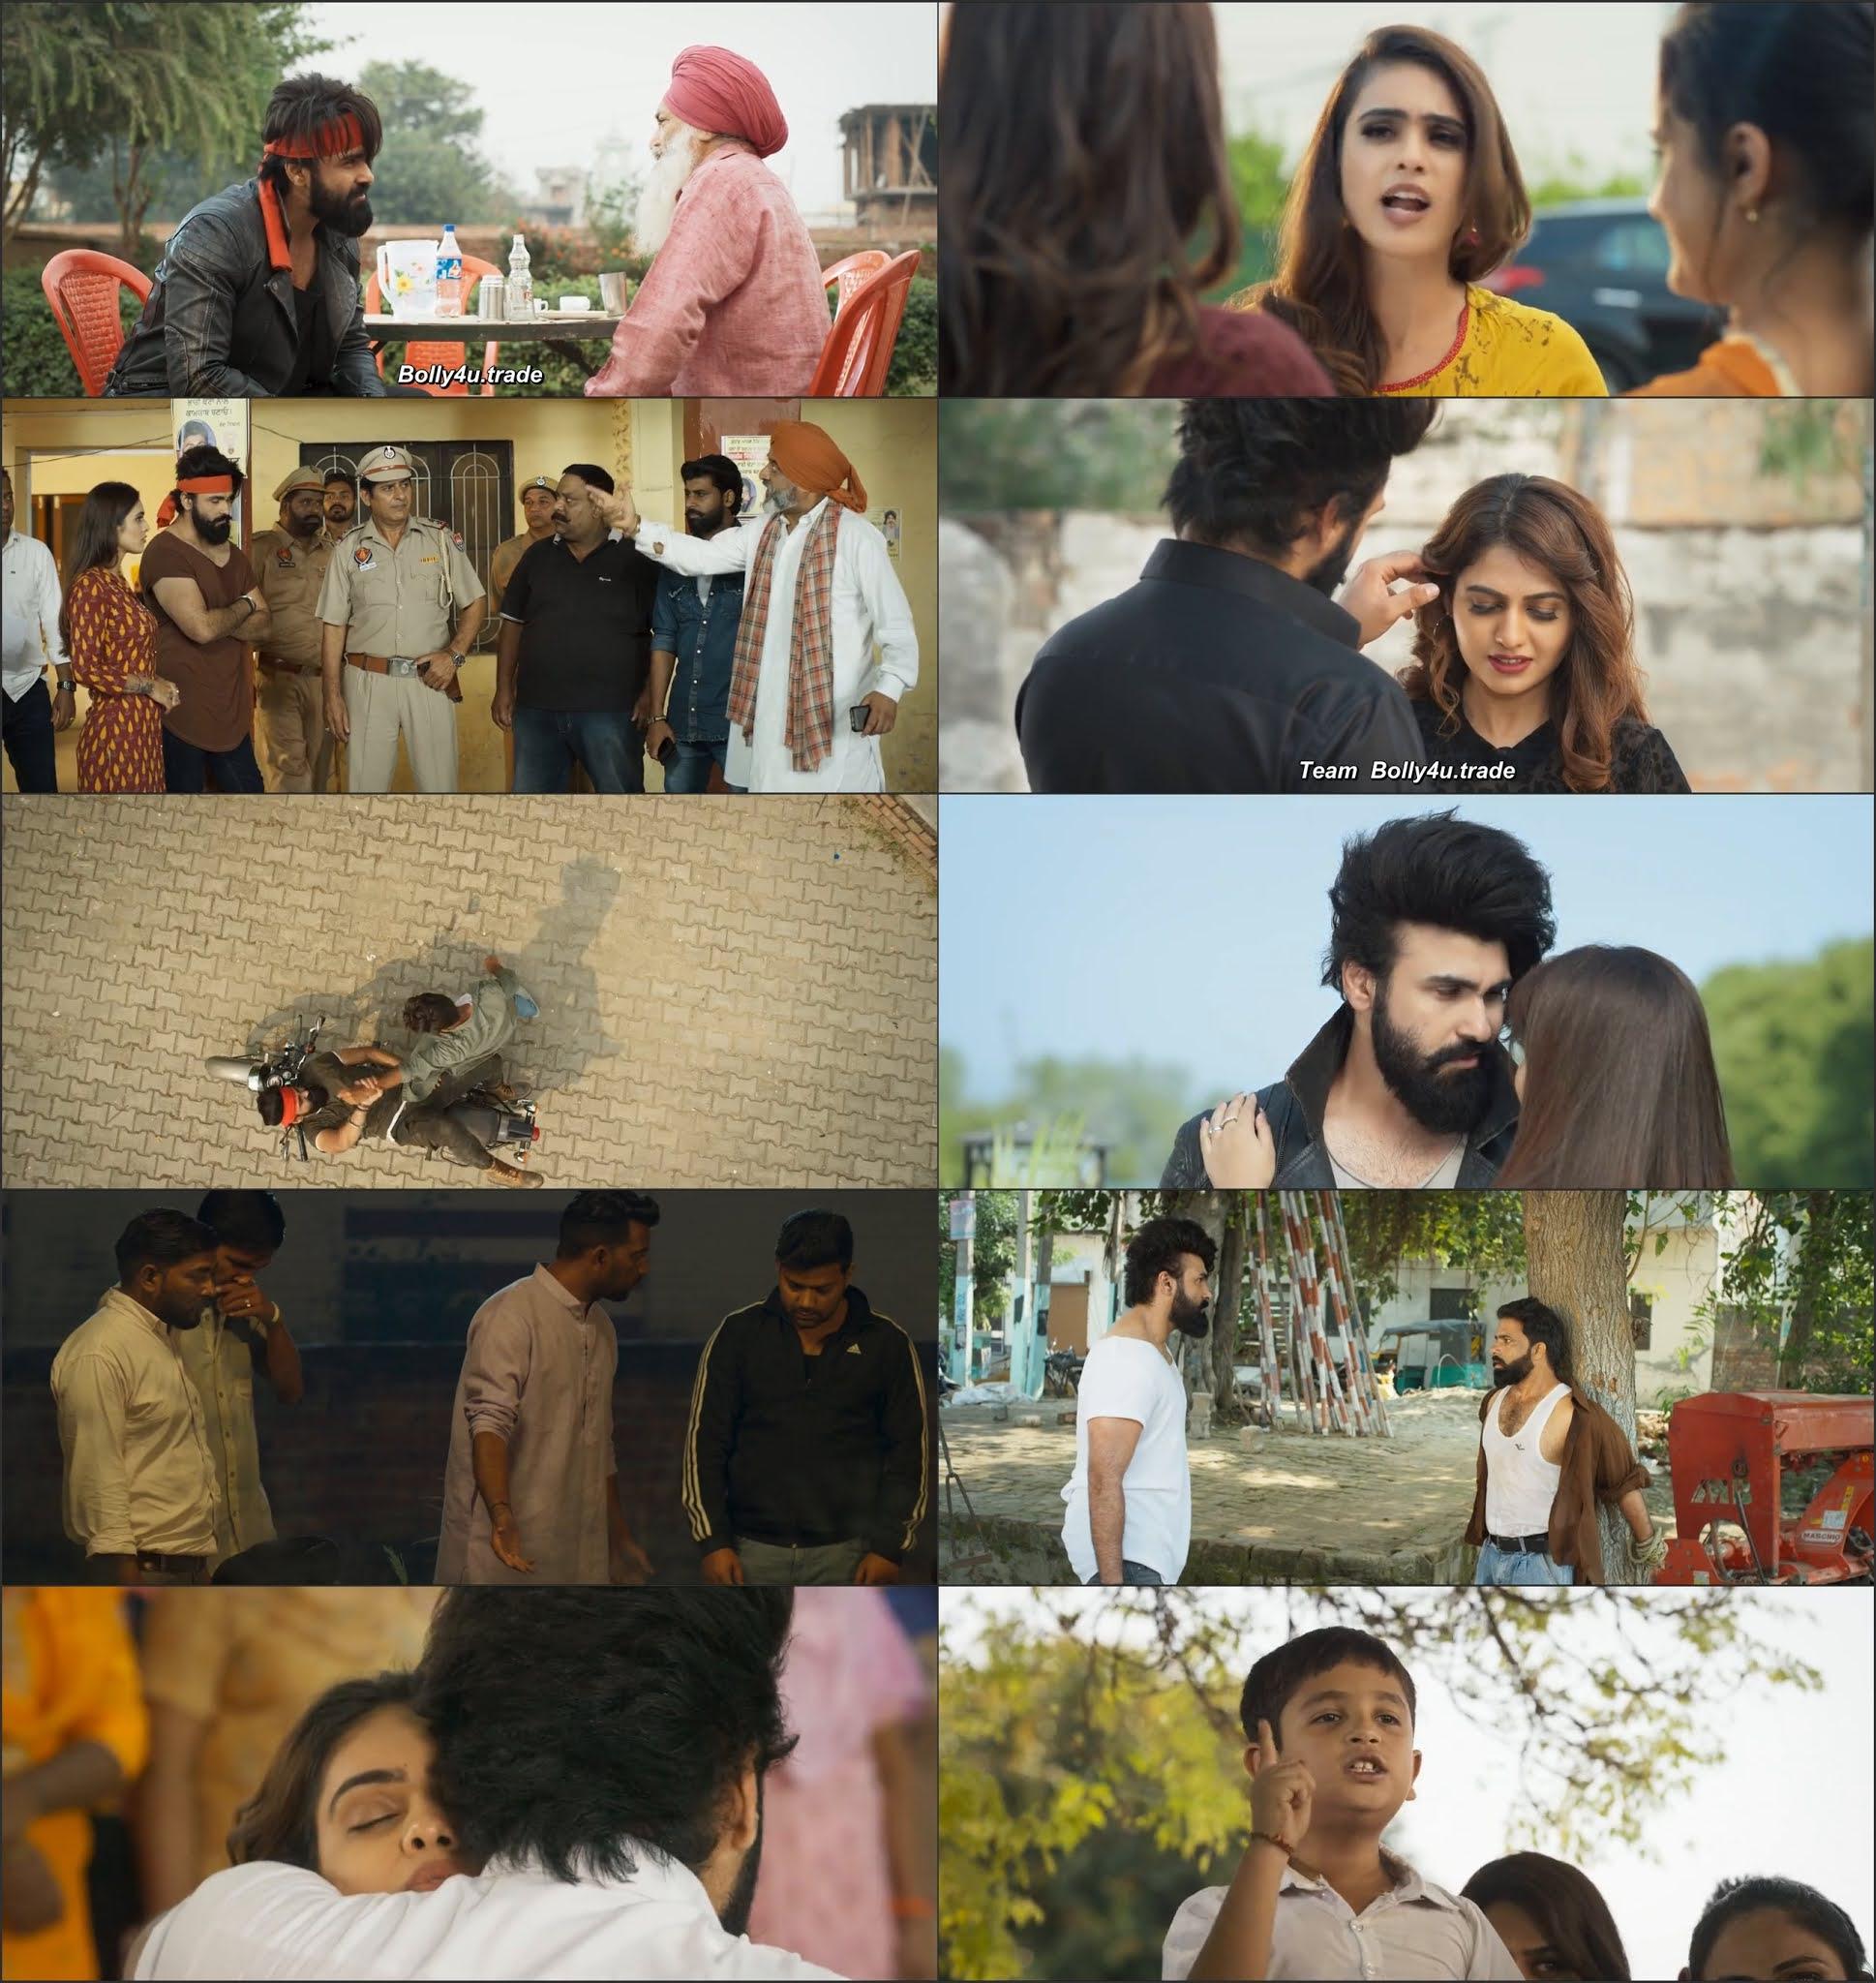 Gandhi Fer Aa Gea 2020 WEB-DL 950Mb Punjabi 720p Download